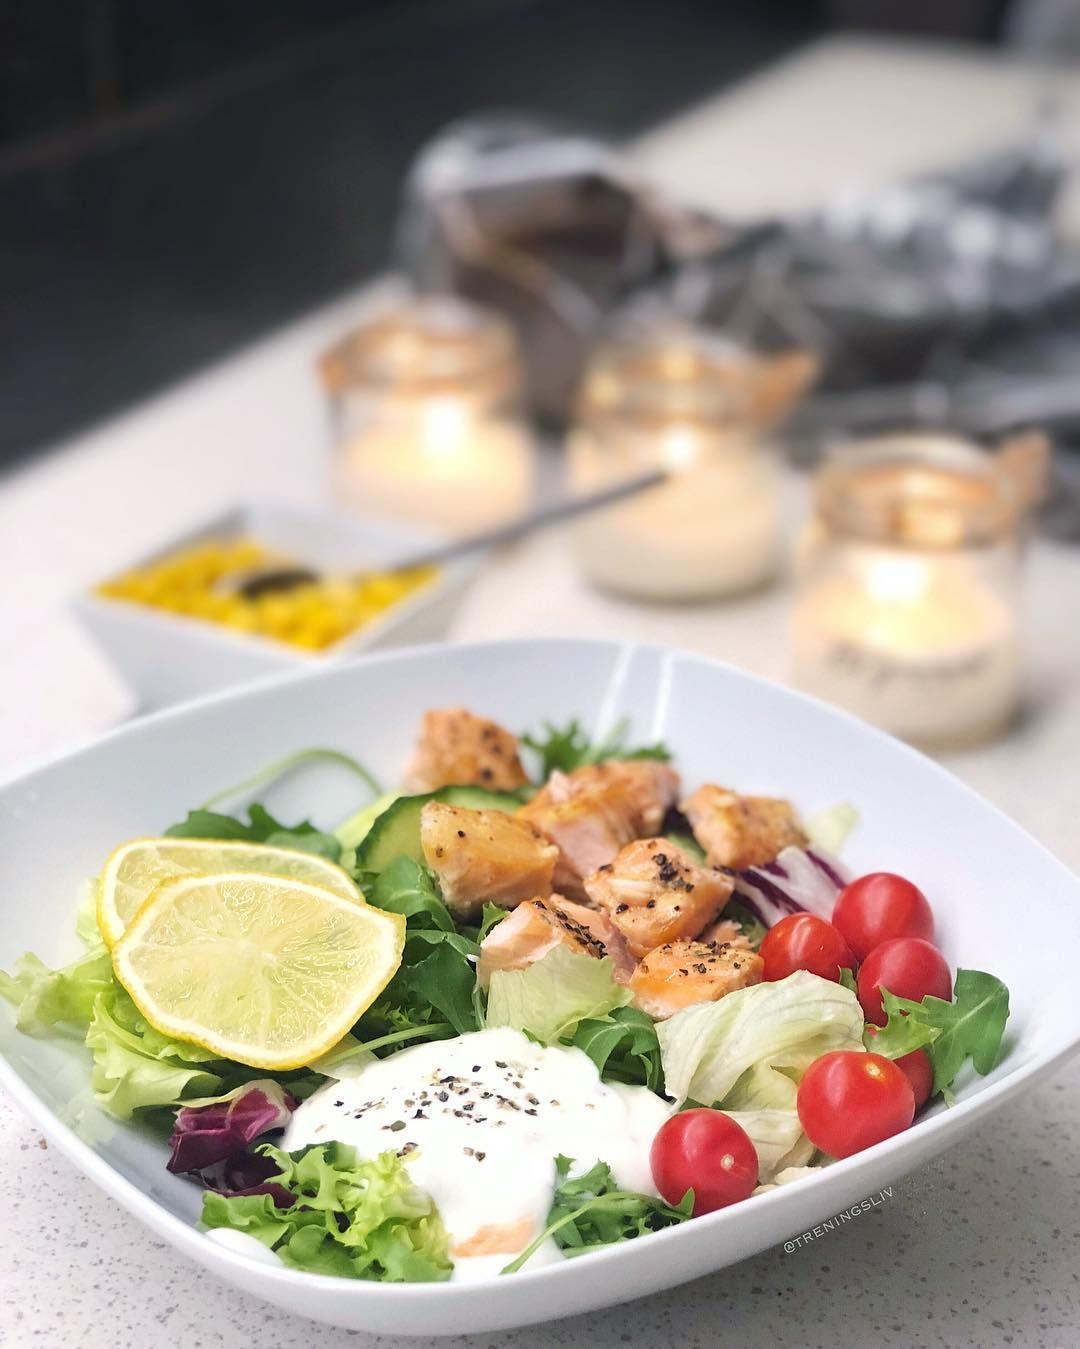 Ovnsbakst Laks Salat Tomater Agurk Mais Sitronsaft